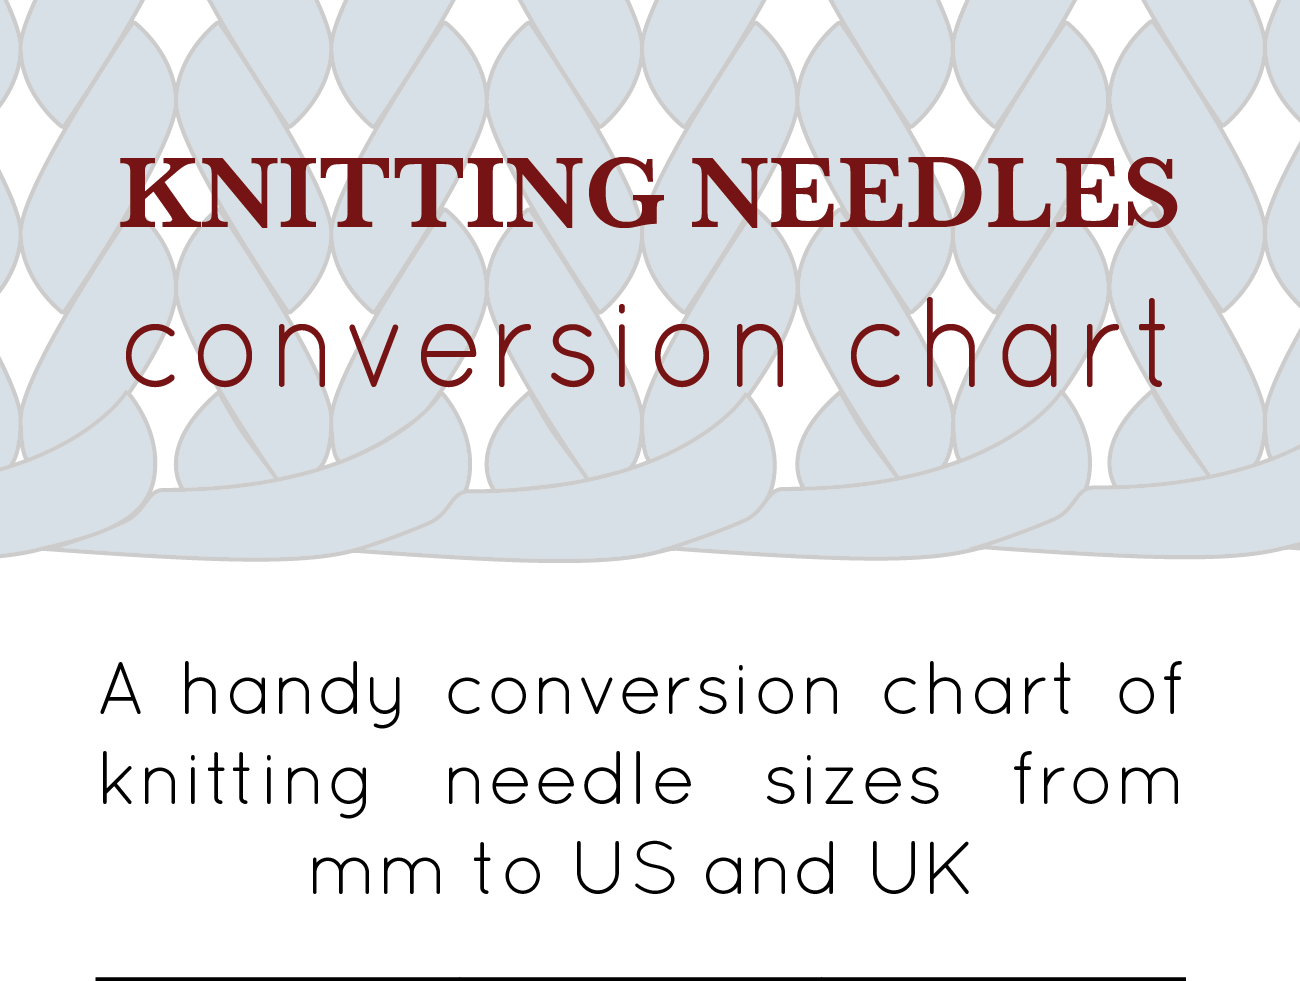 a handy conversion chart of knitting needle sizes